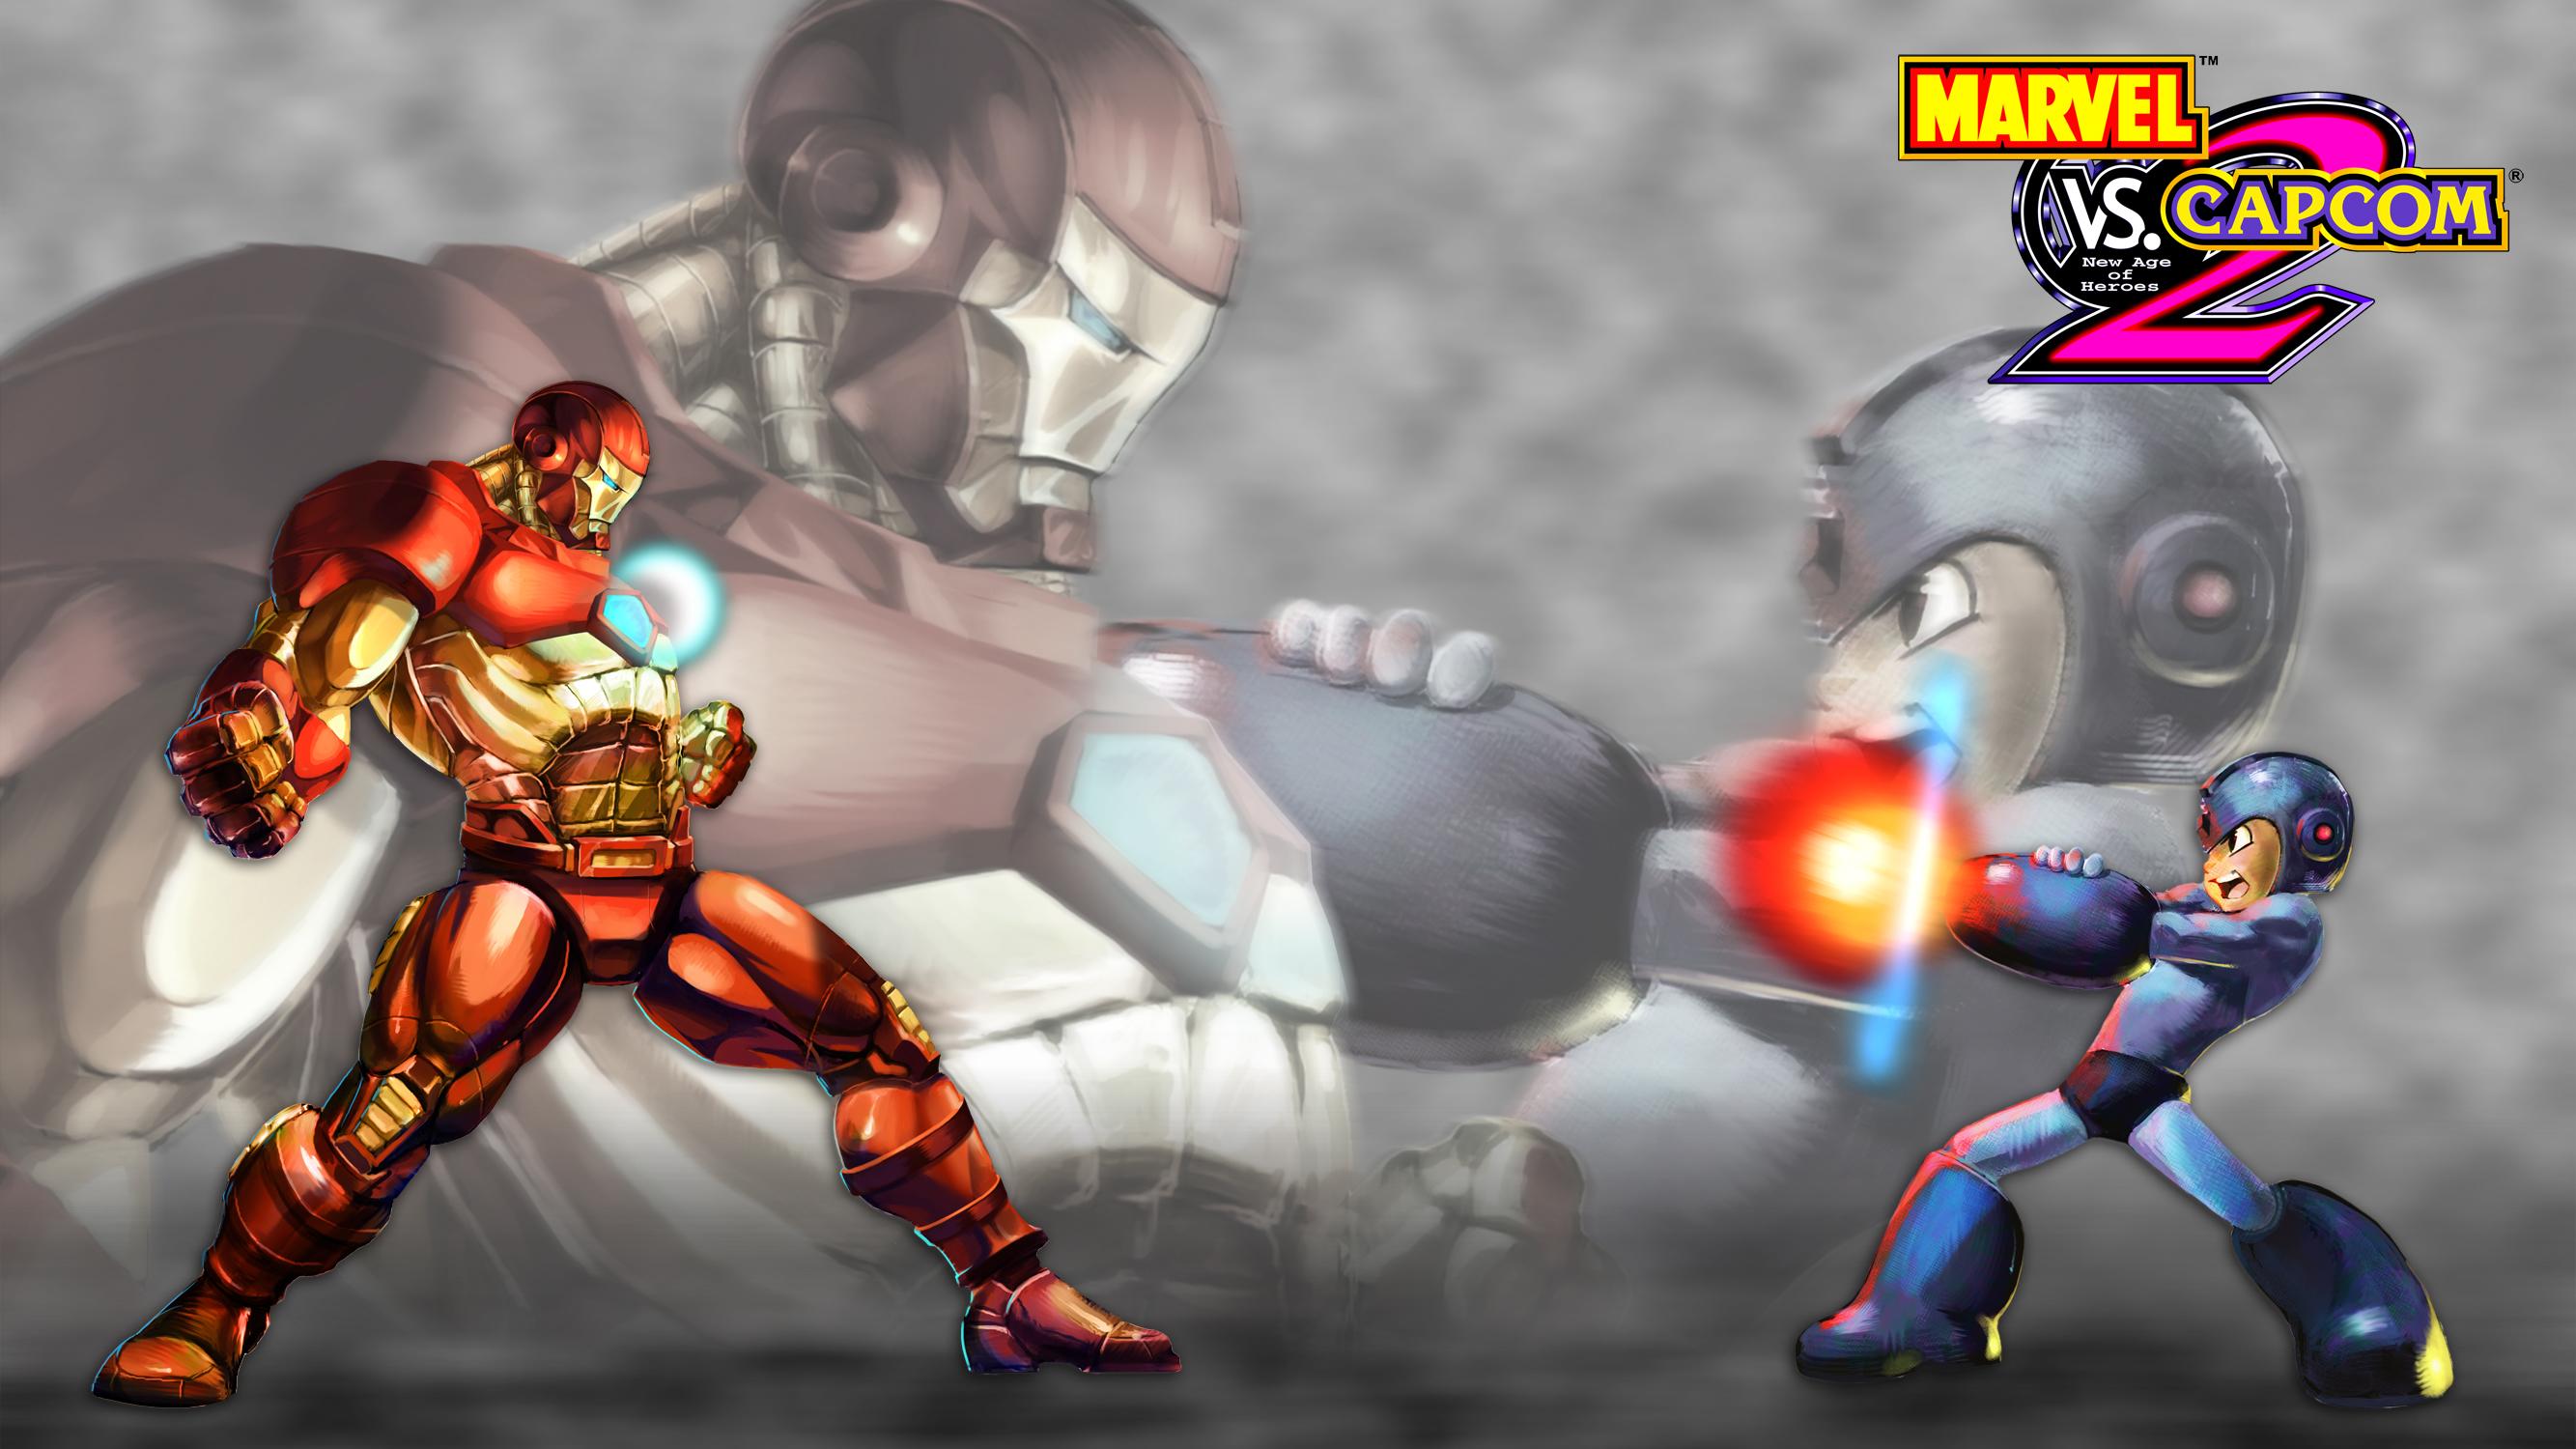 Free Download Marvel Vs Capcom 2 New Age Of Heroes Desktop